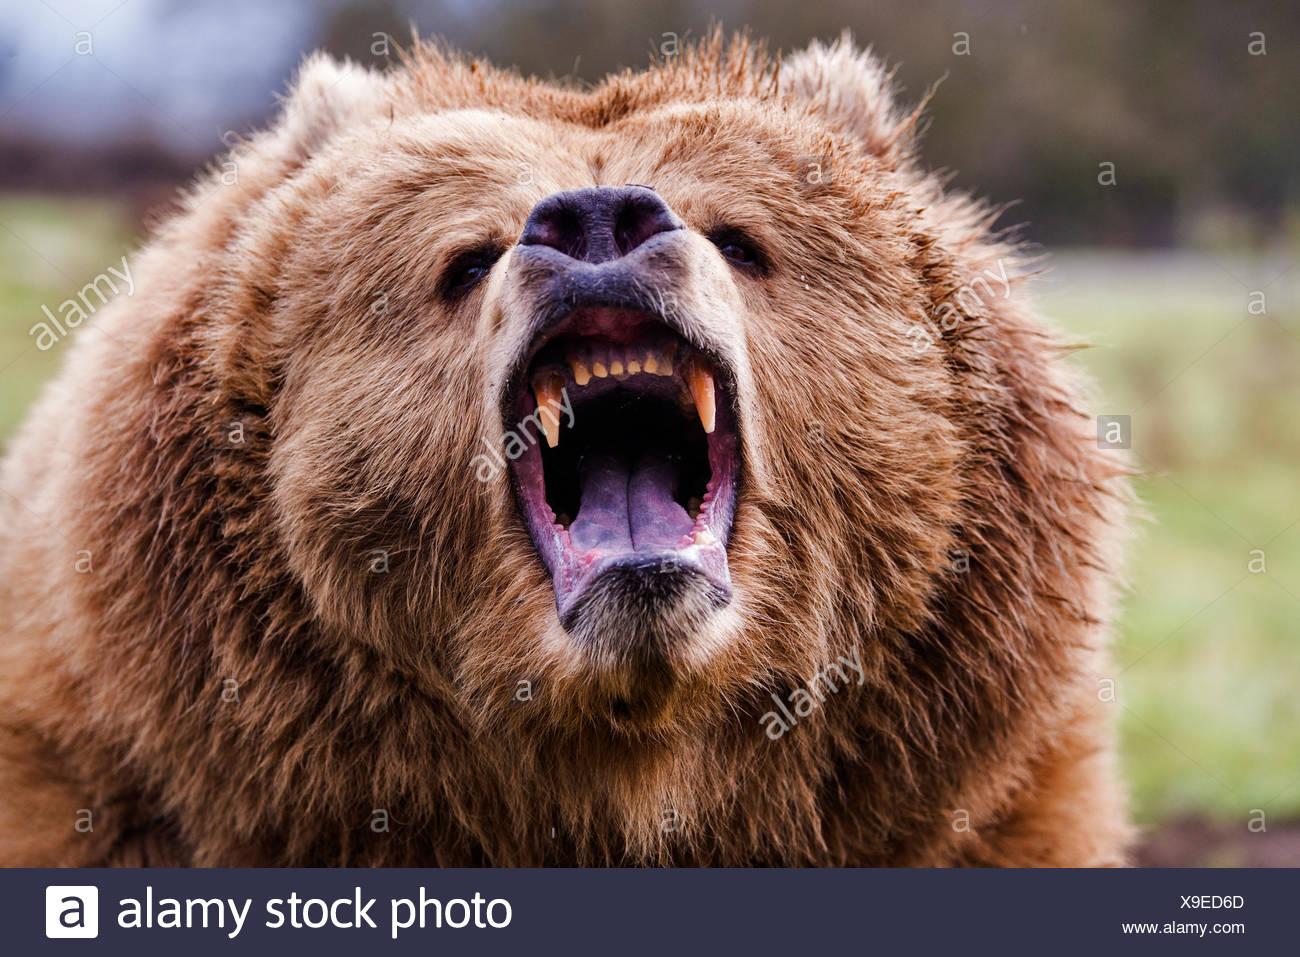 Orso grizzly, Ursus arctos, orso, animale, STATI UNITI D'AMERICA, testa Immagini Stock